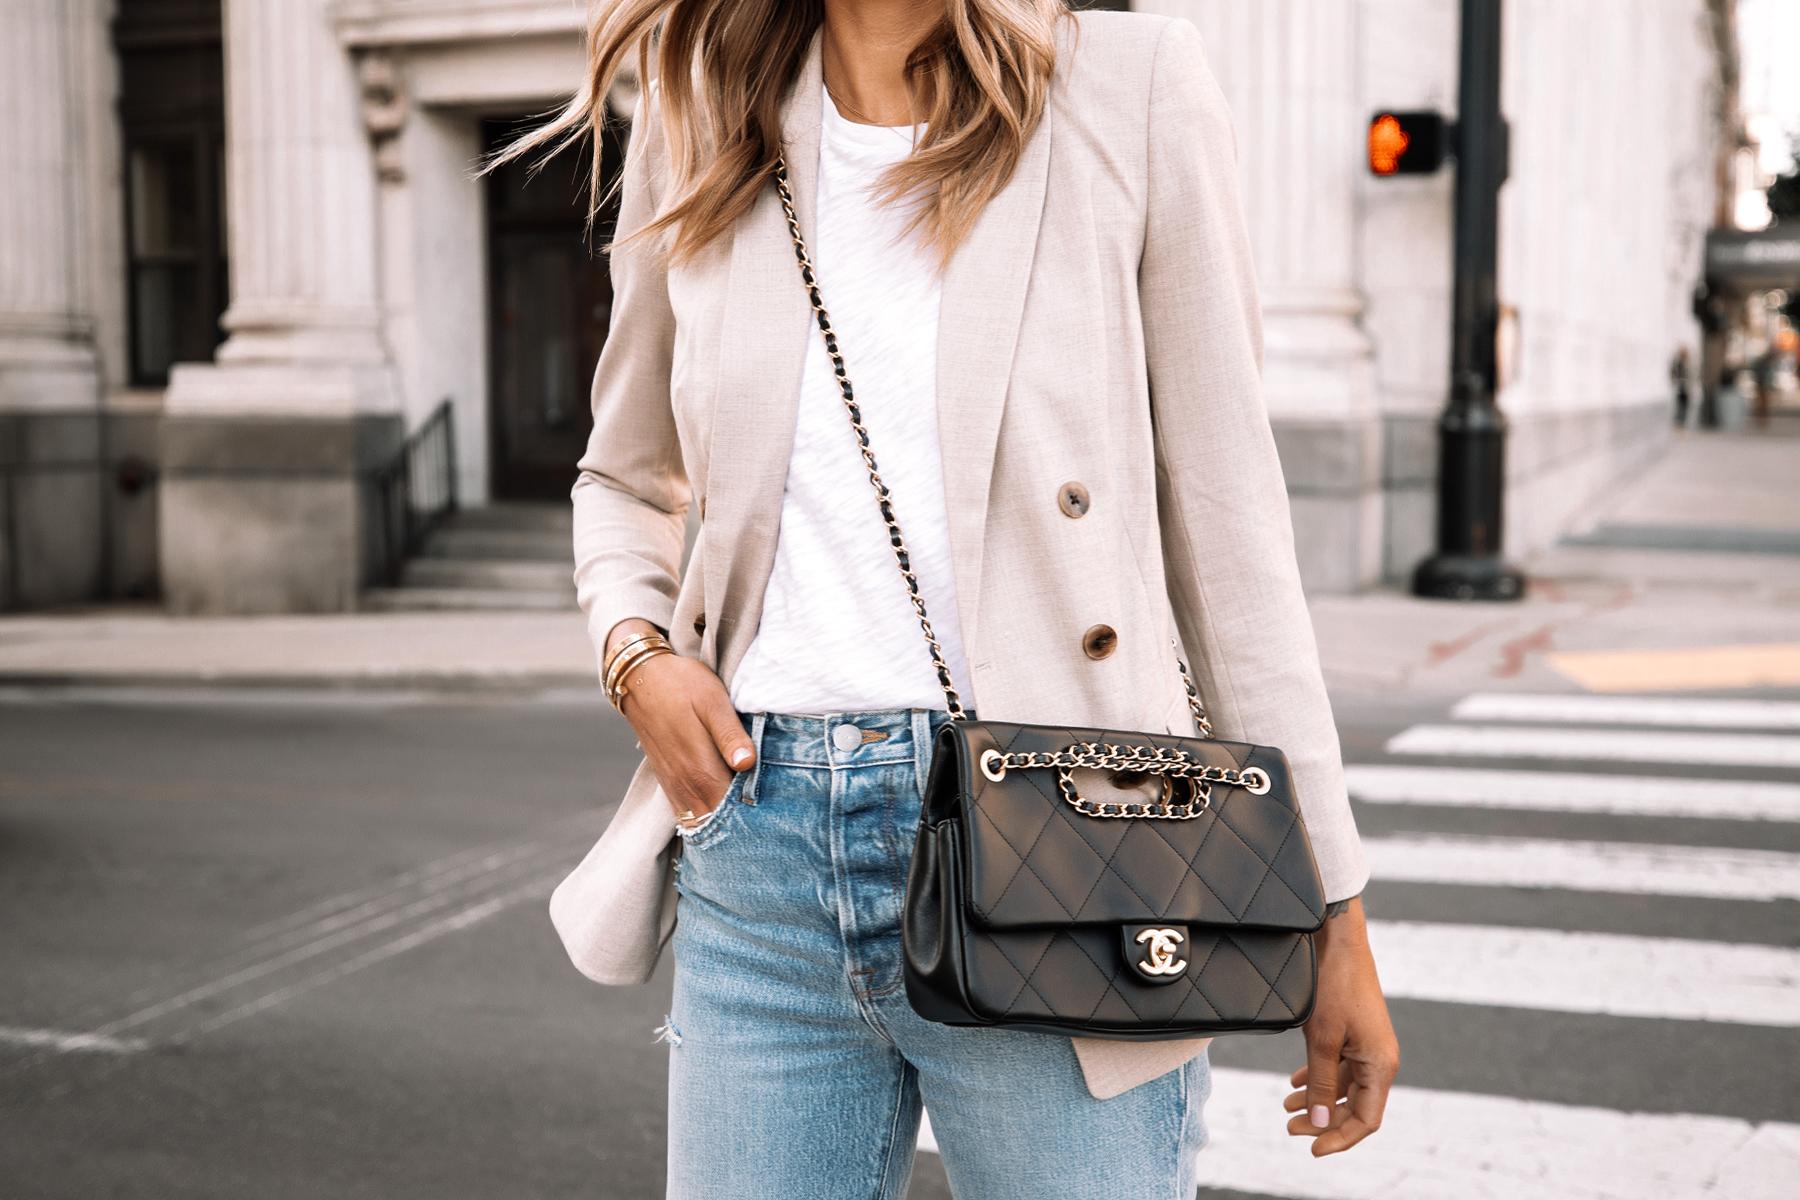 Fashion Jackson Wearing Express Beige Blazer Outfit White Tshirt Jeans Black Chain Chanel Handbag